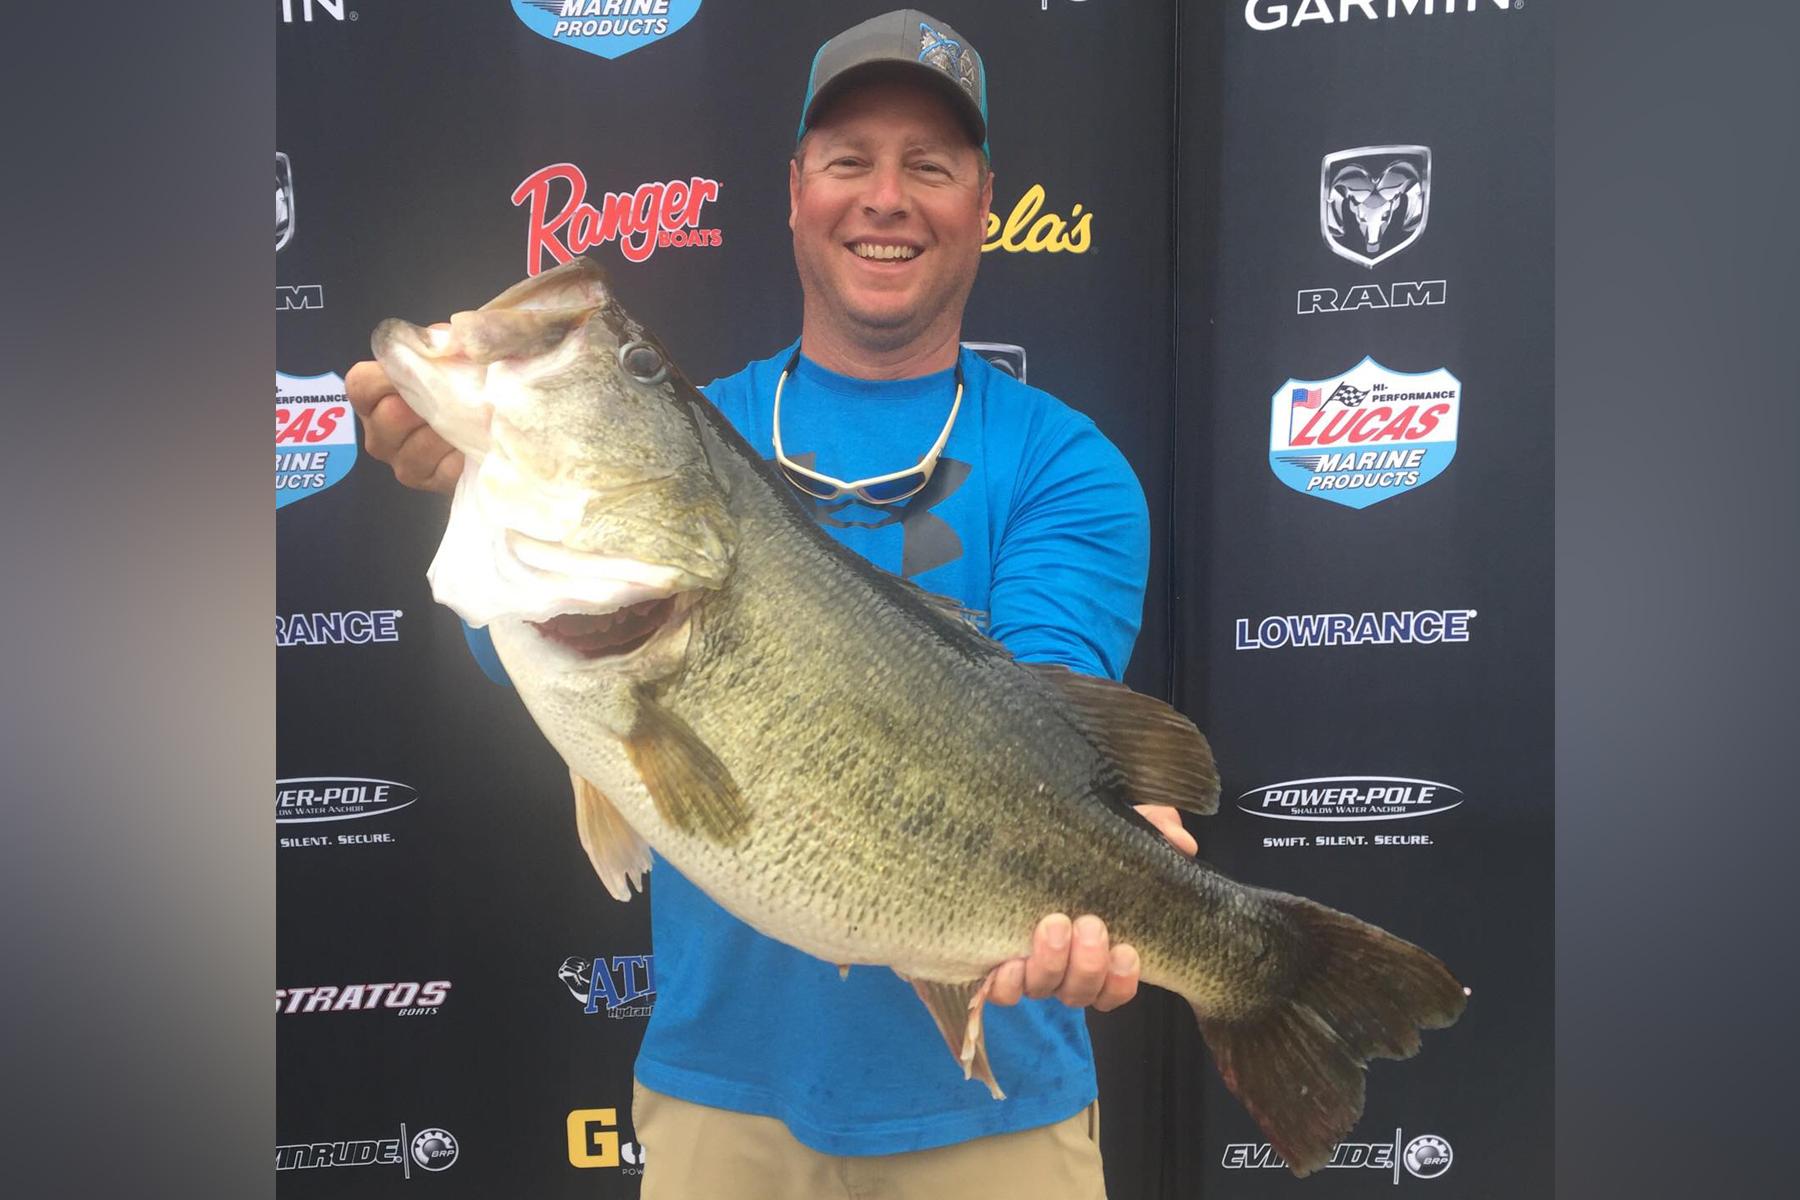 Angler catches record largemouth bass at for Belton lake fishing